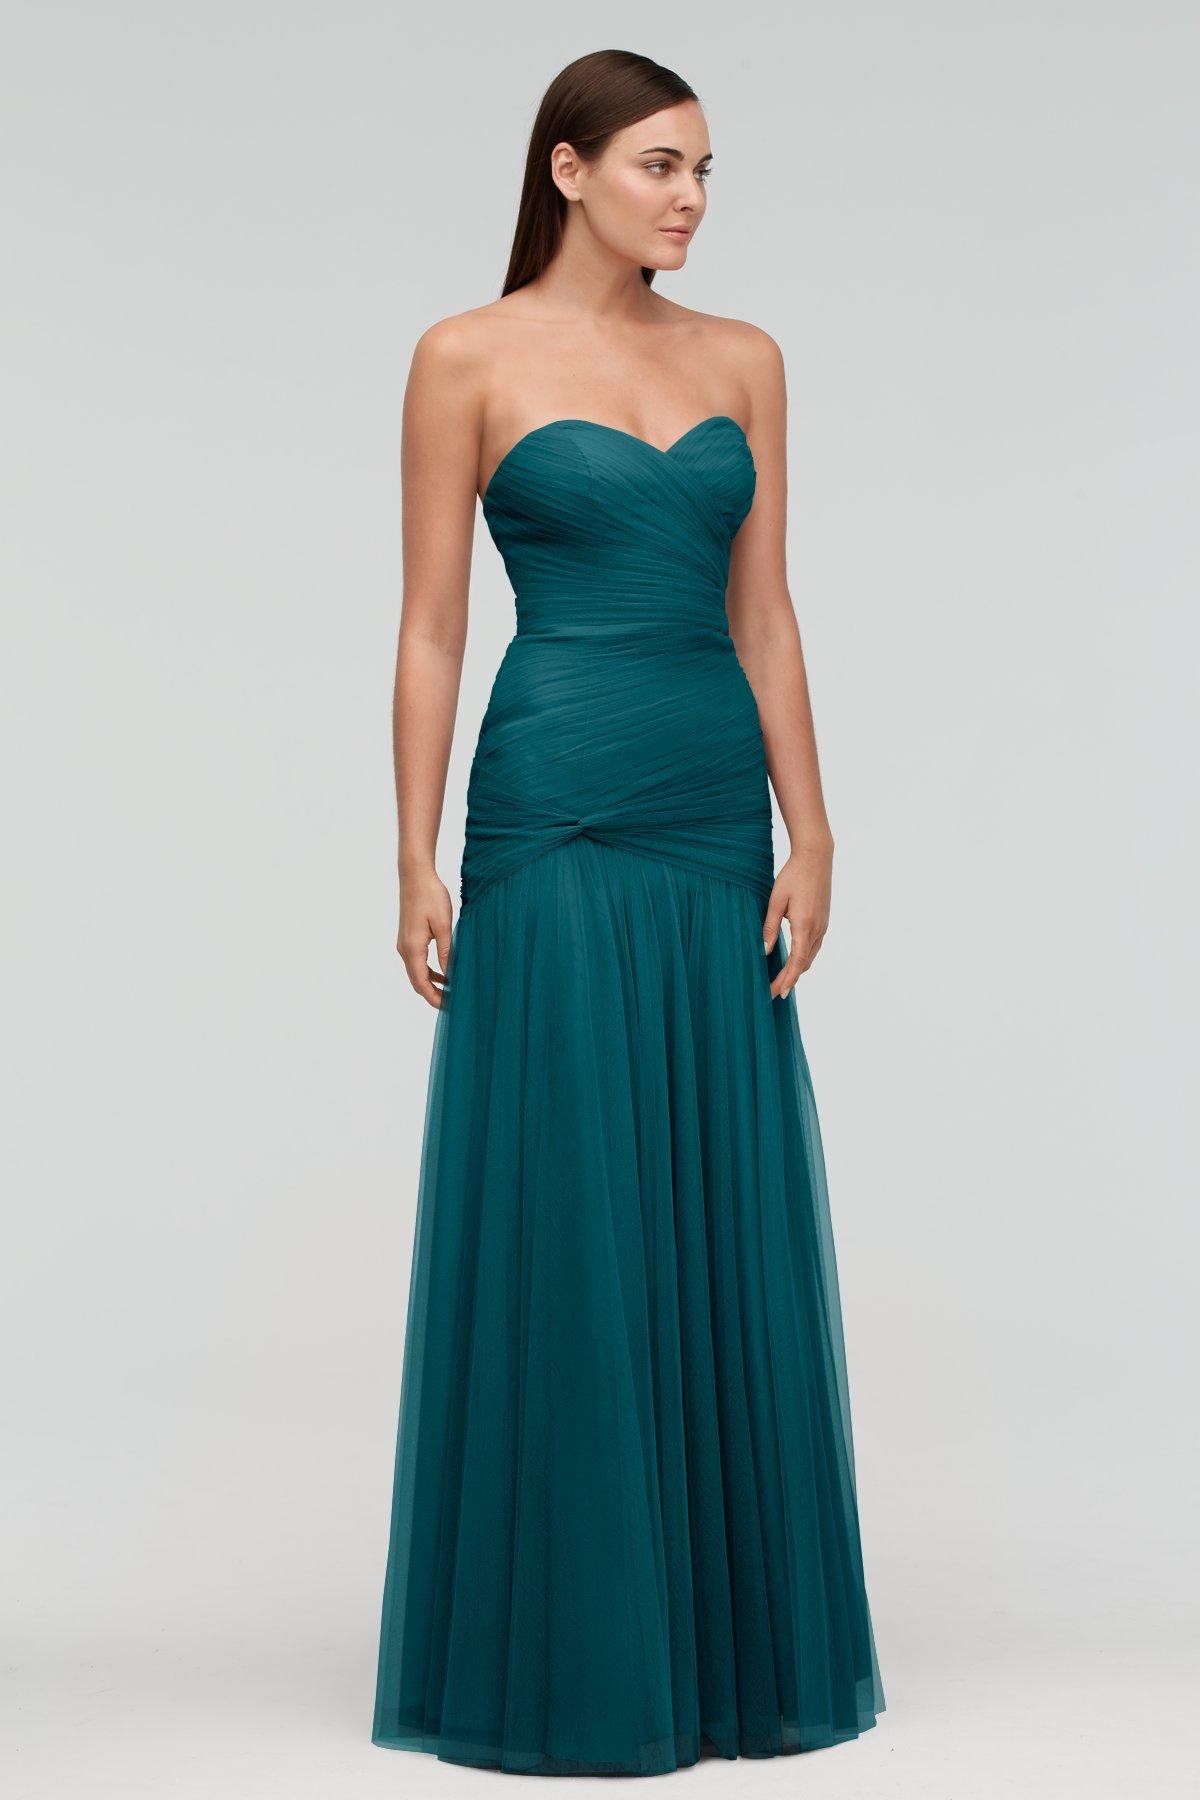 Viridian Sweetheart Bridesmaid Dress